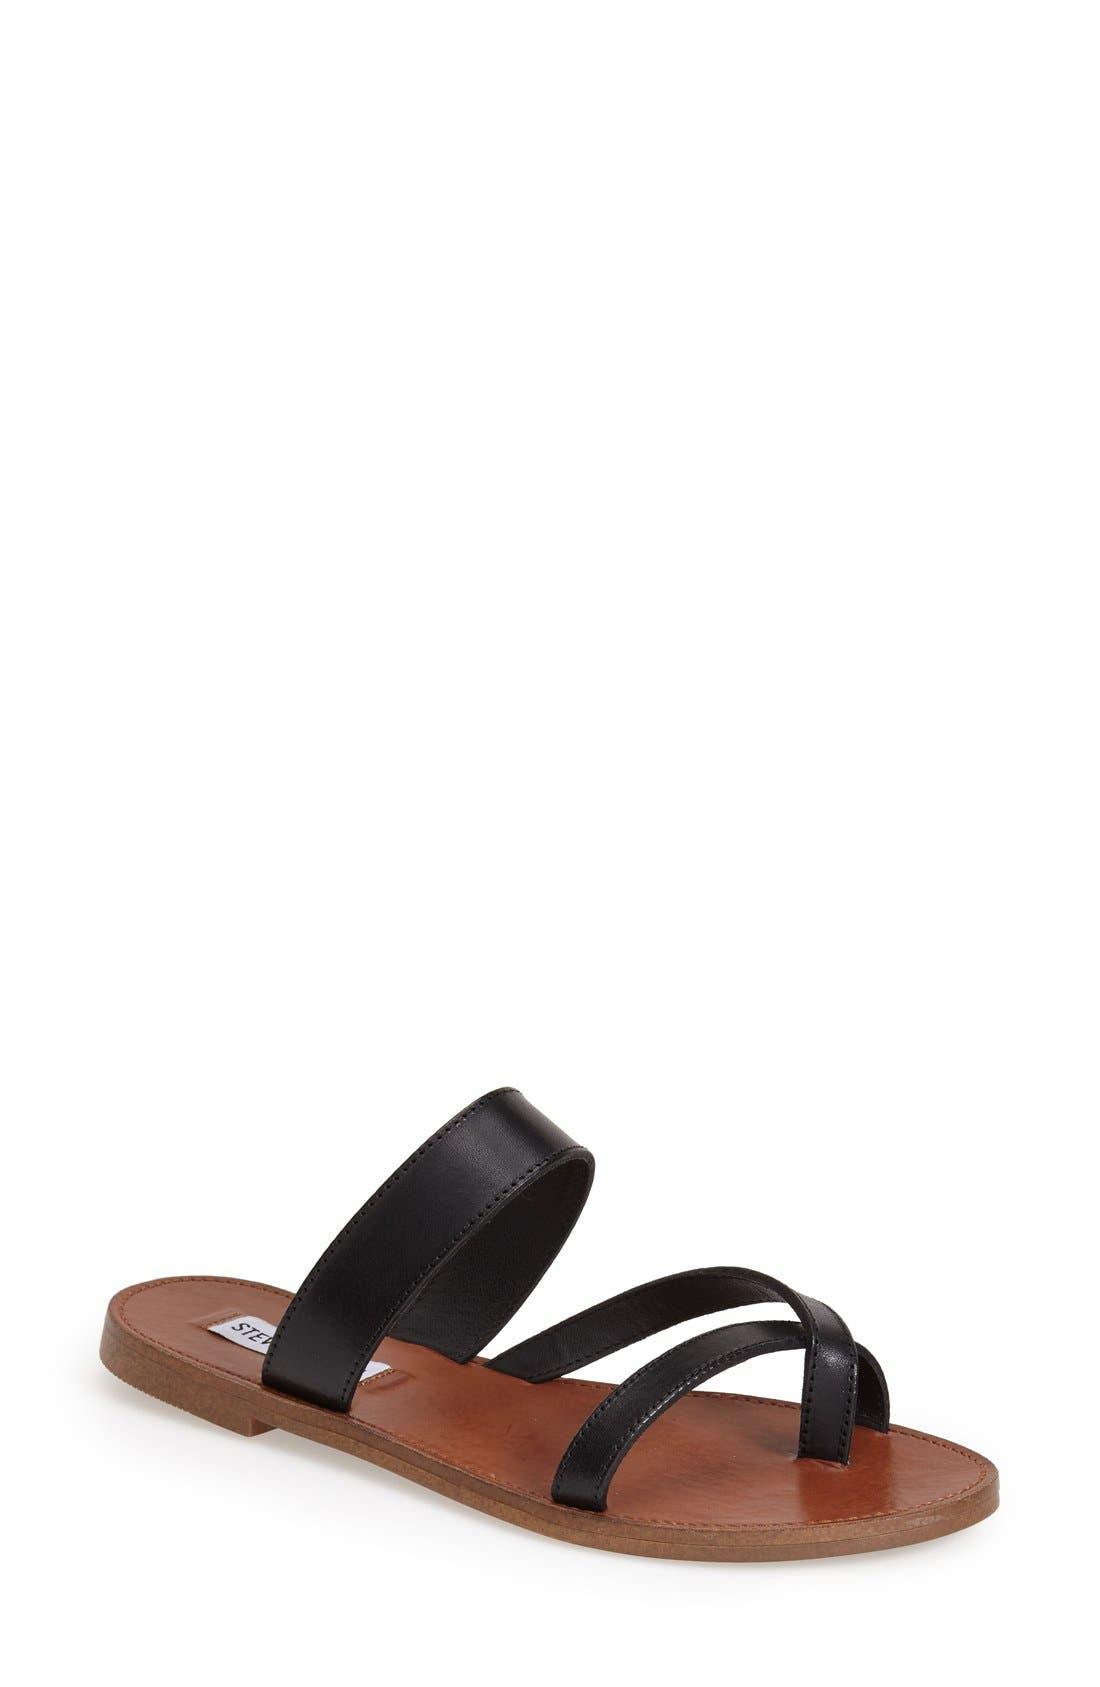 Alternate Image 1 Selected - Steve Madden 'Aintso' Strappy Leather Toe Ring Sandal (Women)